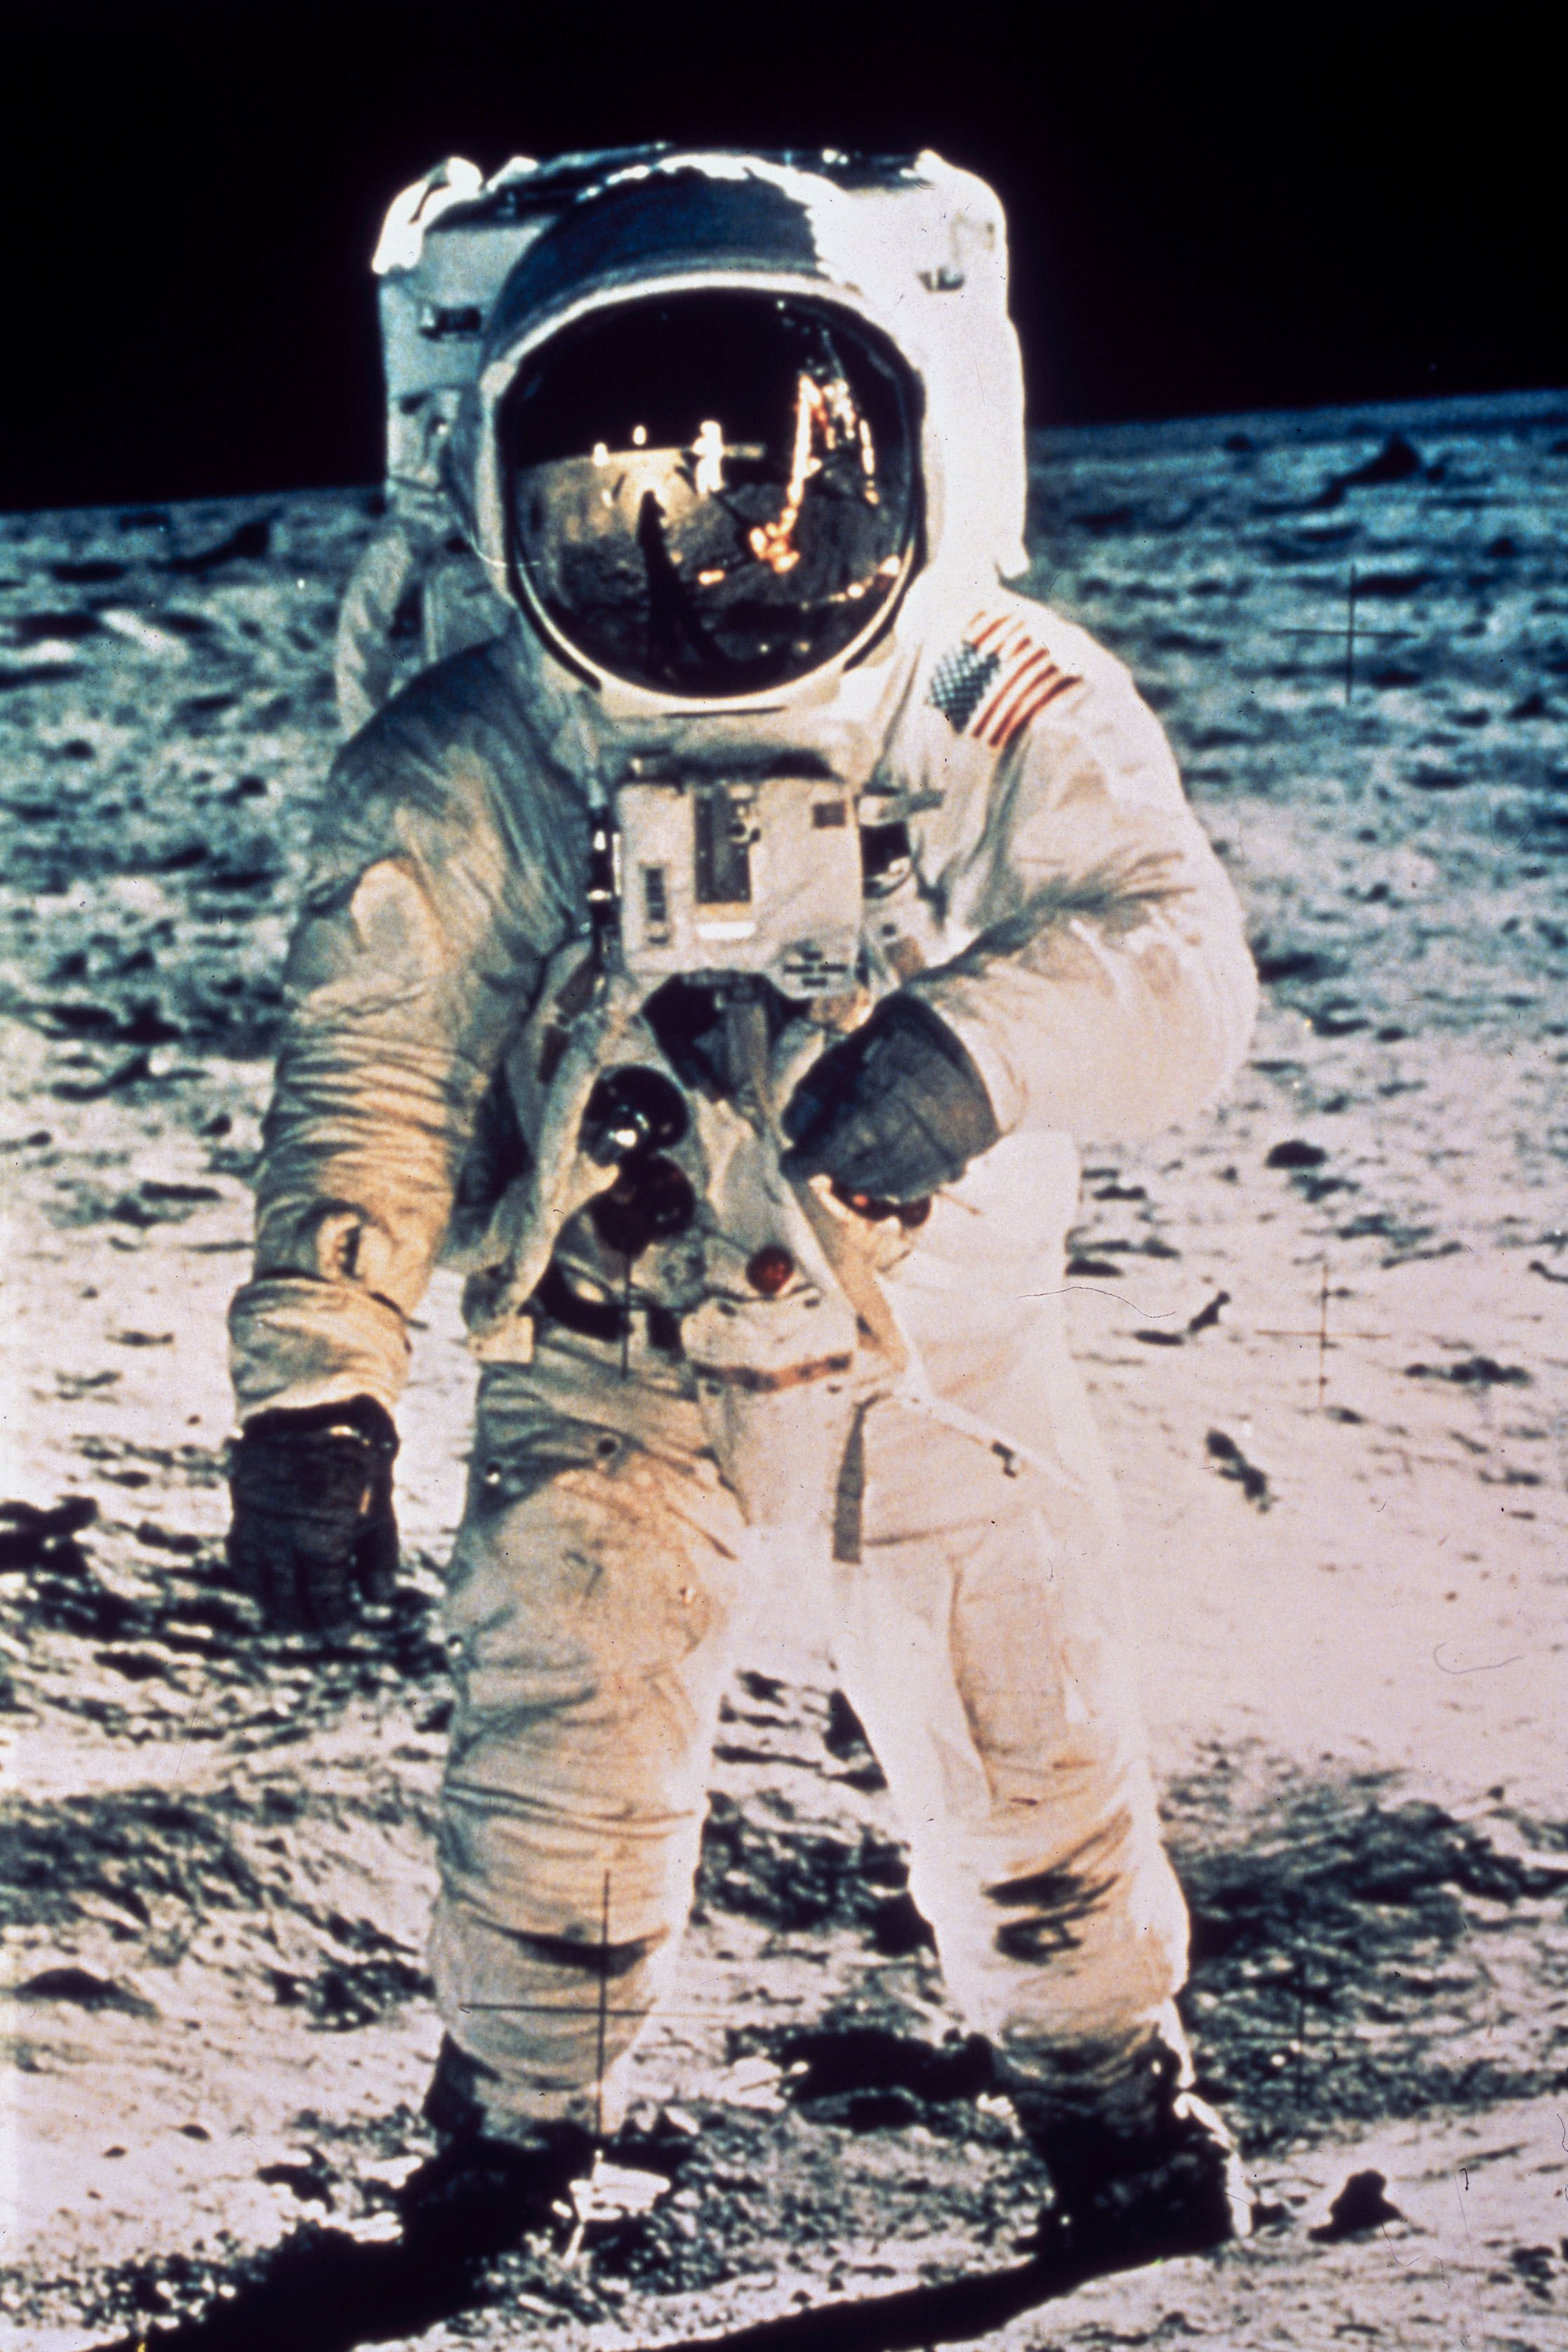 Edwin �Buzz� Aldrin on the Moon, 1969.